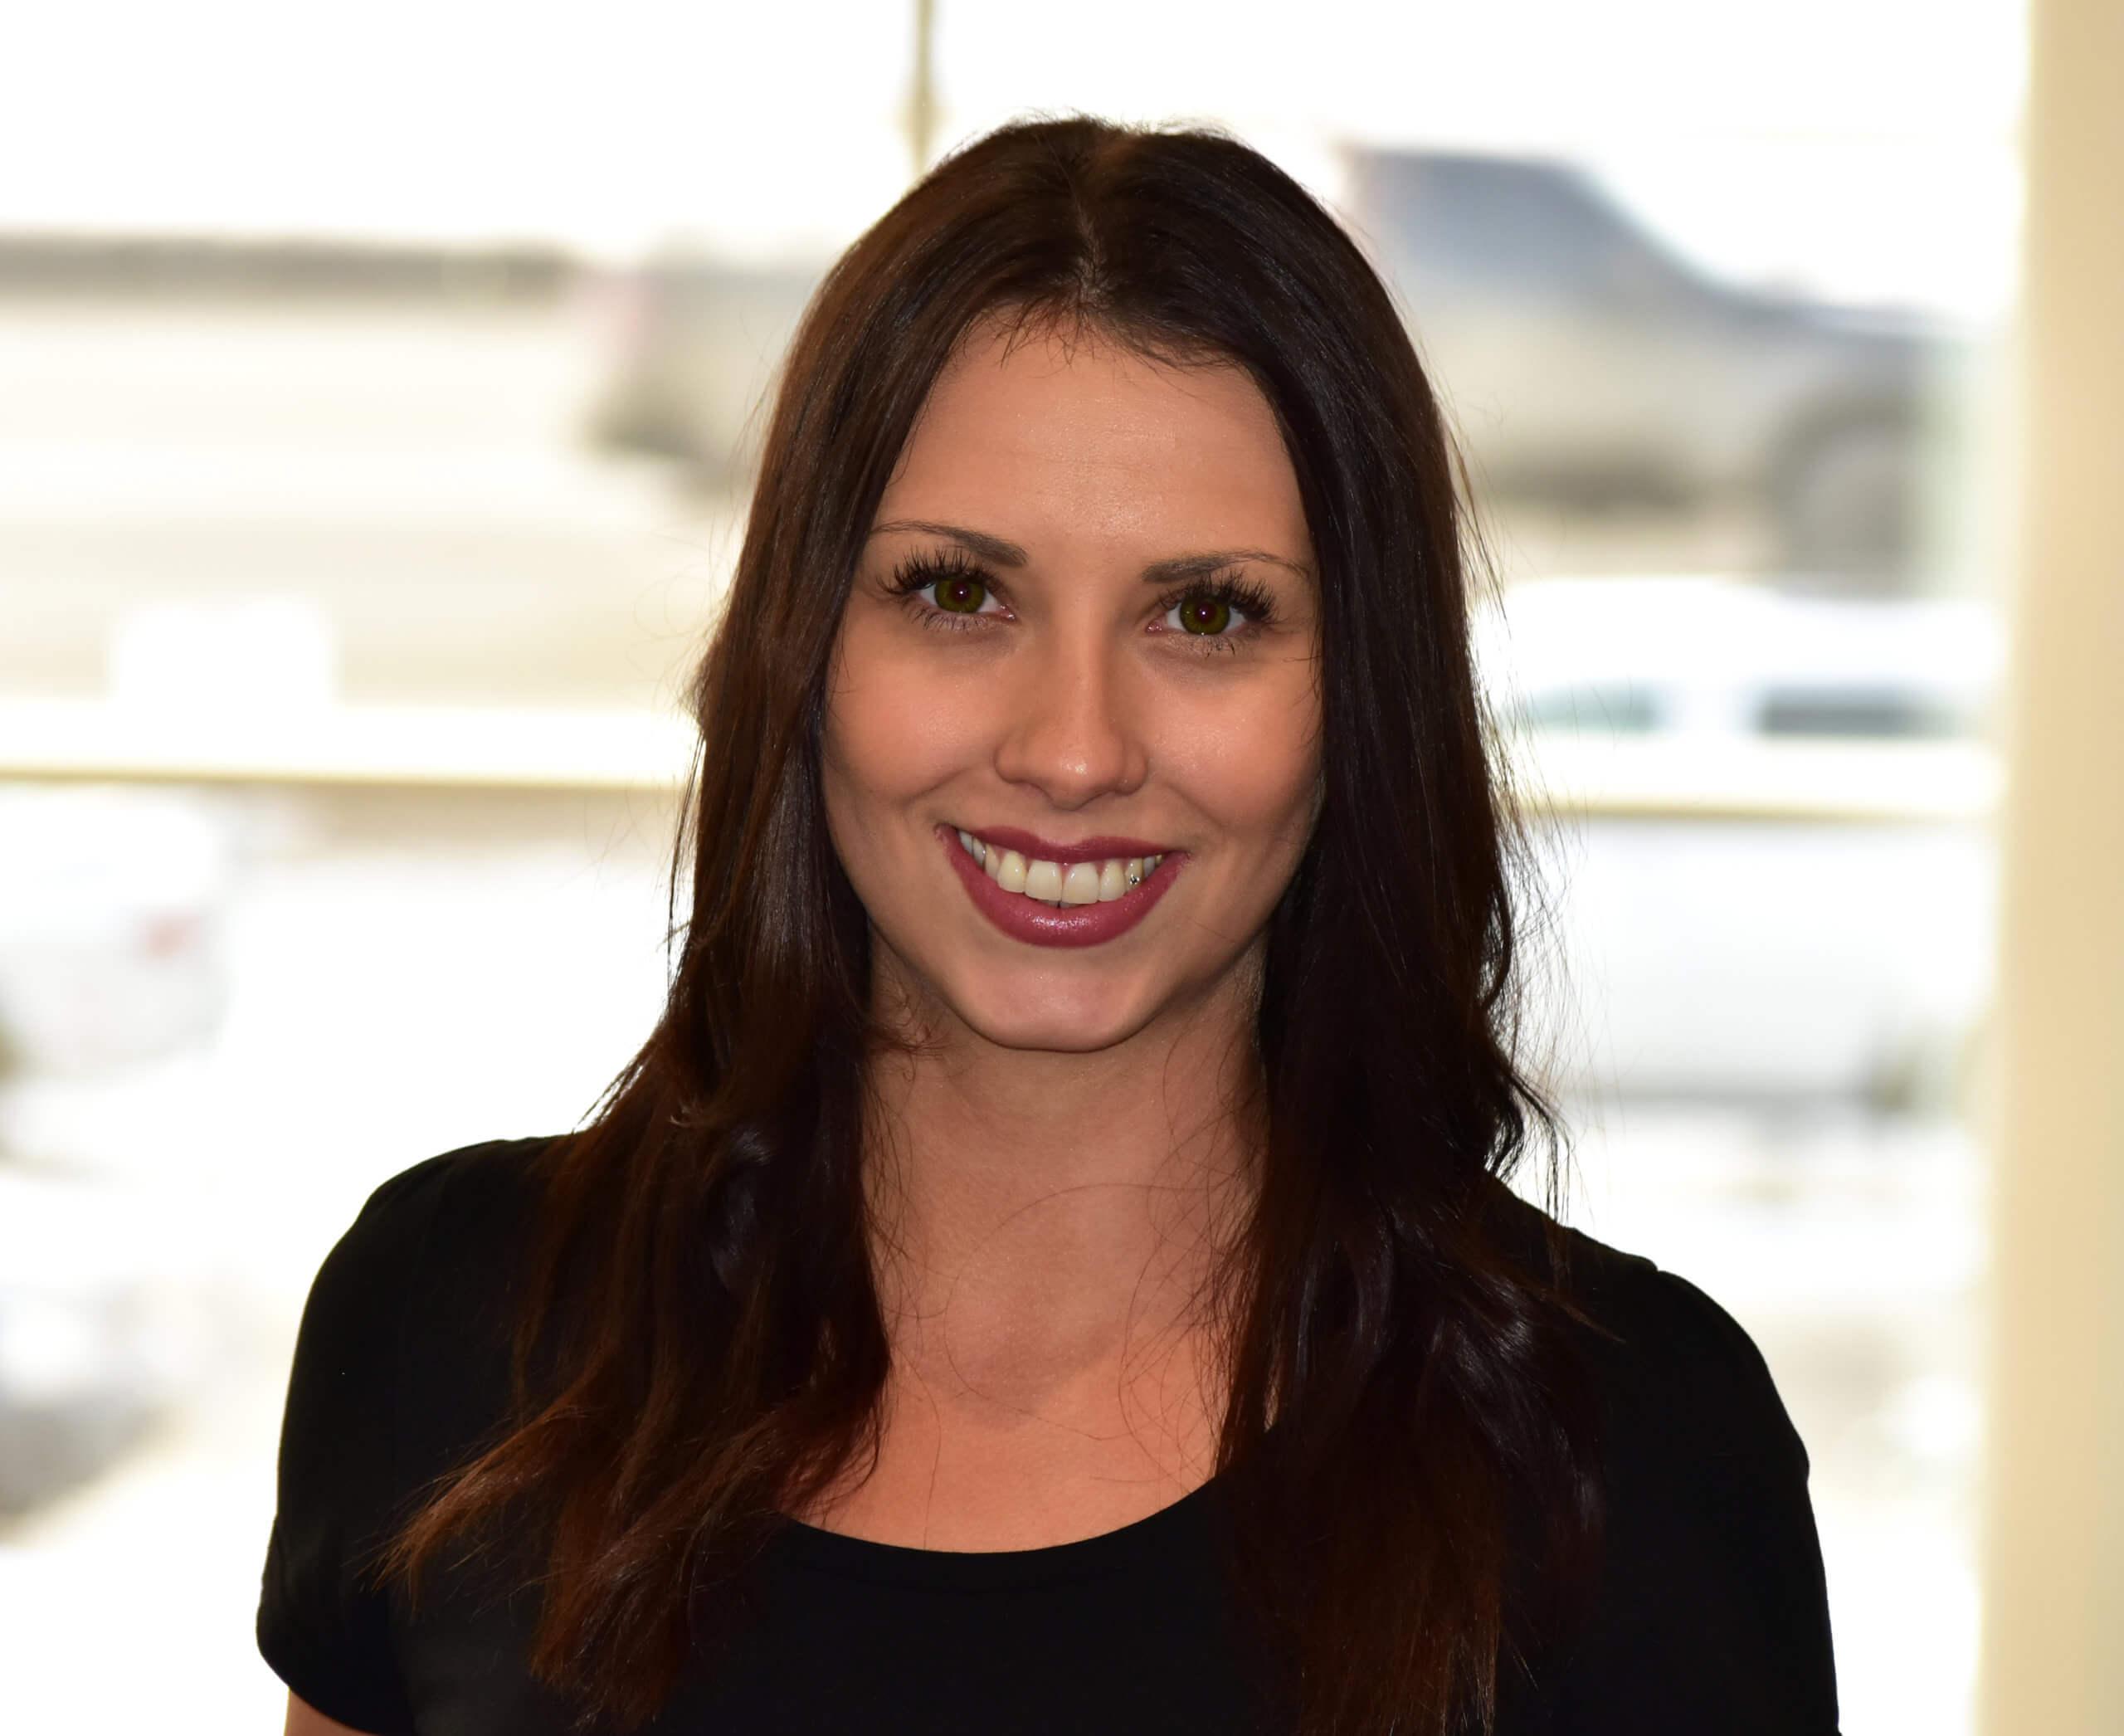 Jessica Kavanagh